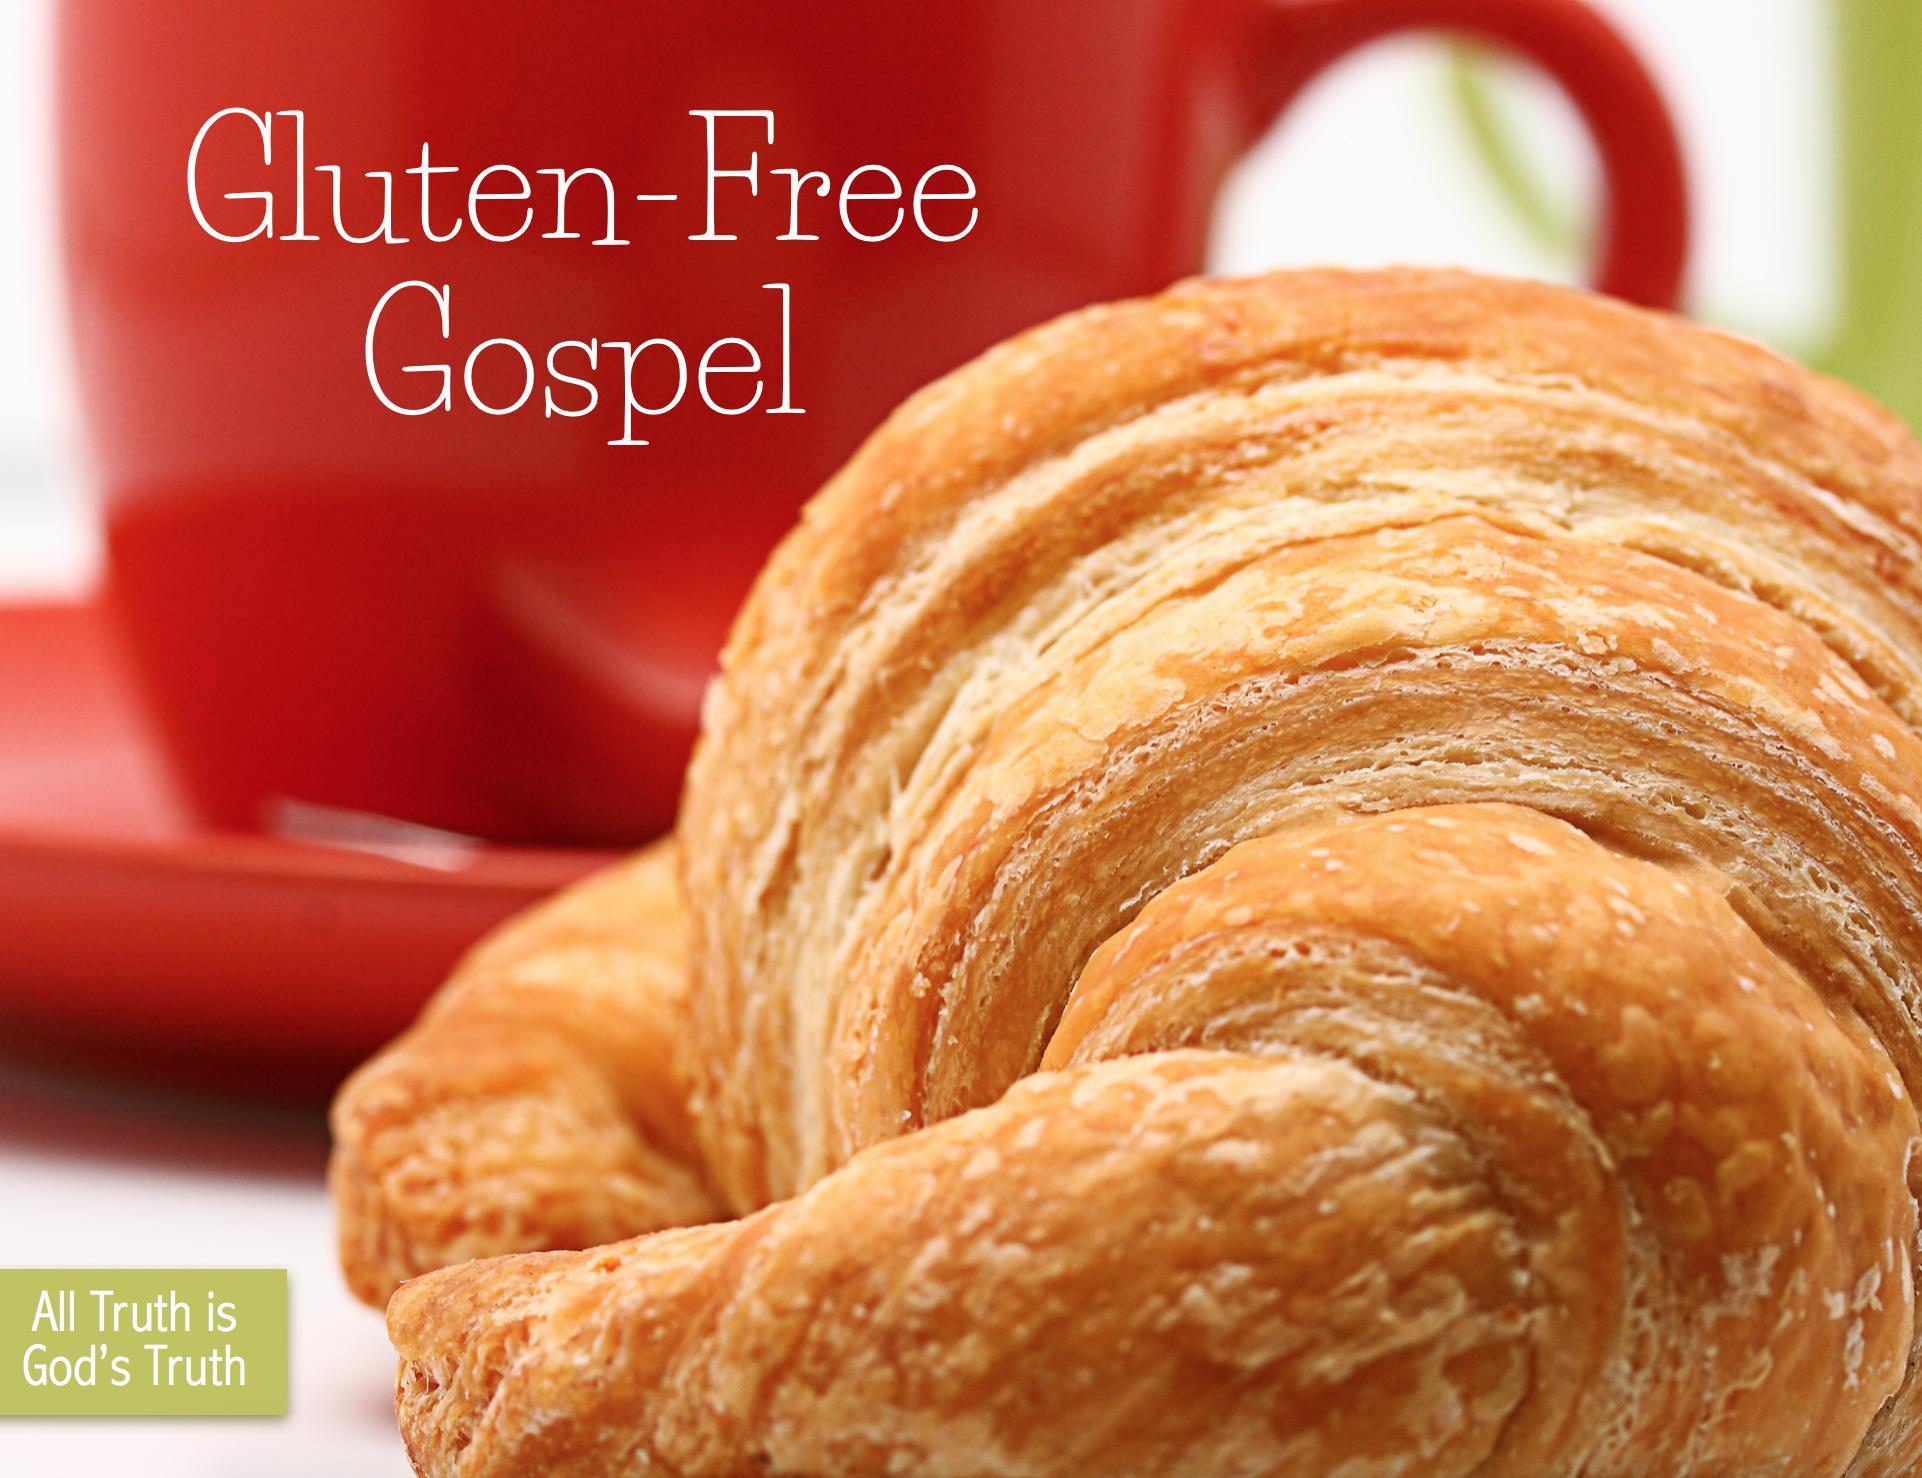 The Gluten-Free Gospel